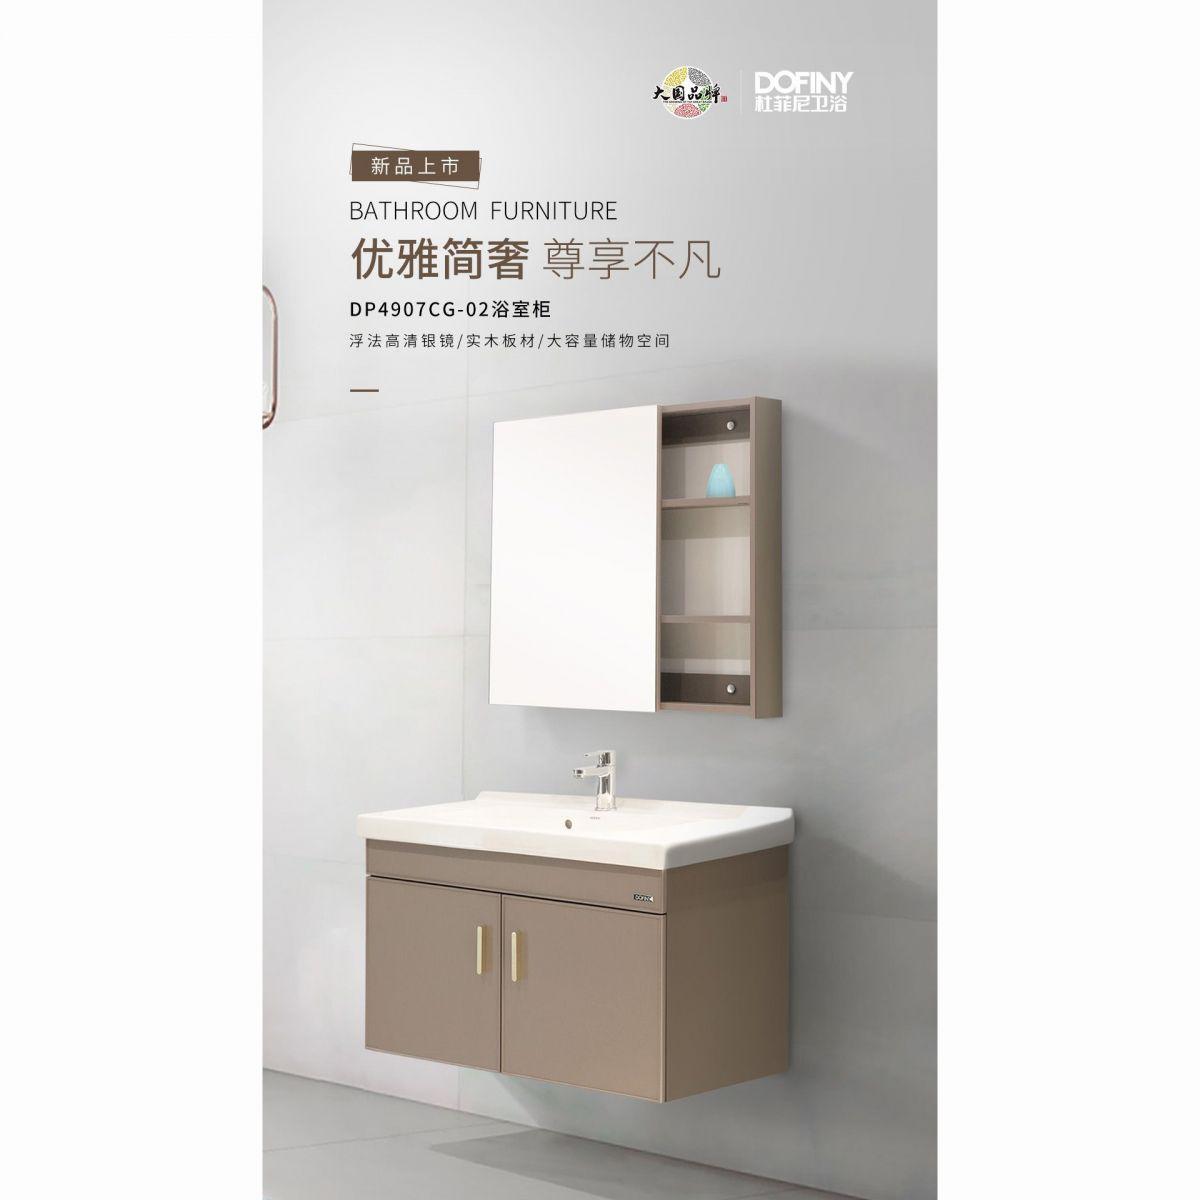 DP4907CG-02-浴室柜